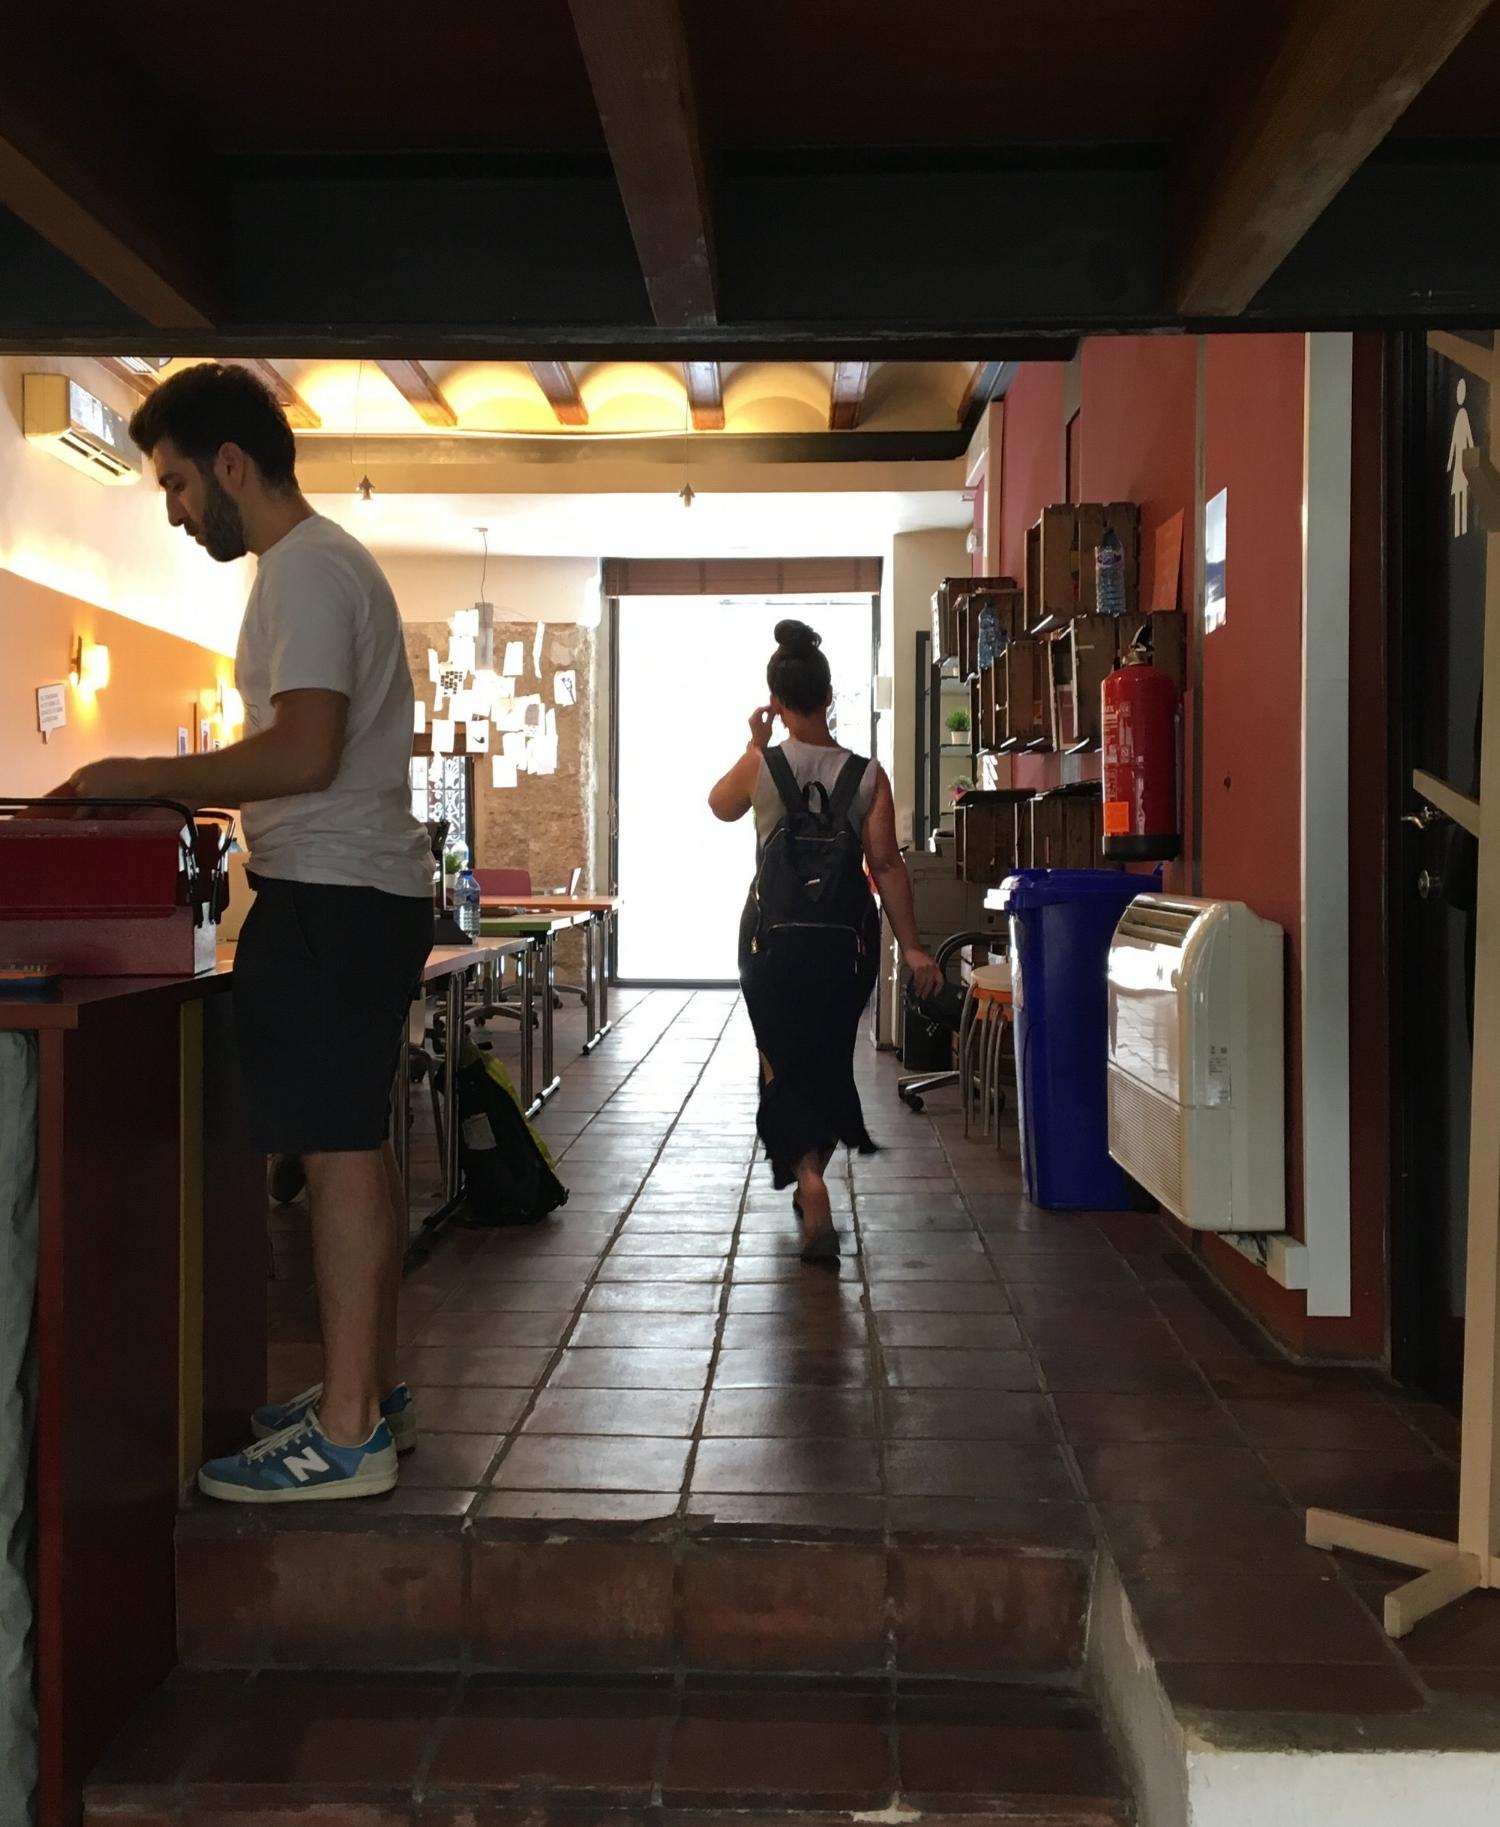 Wayco co-working space - alencia, Spain